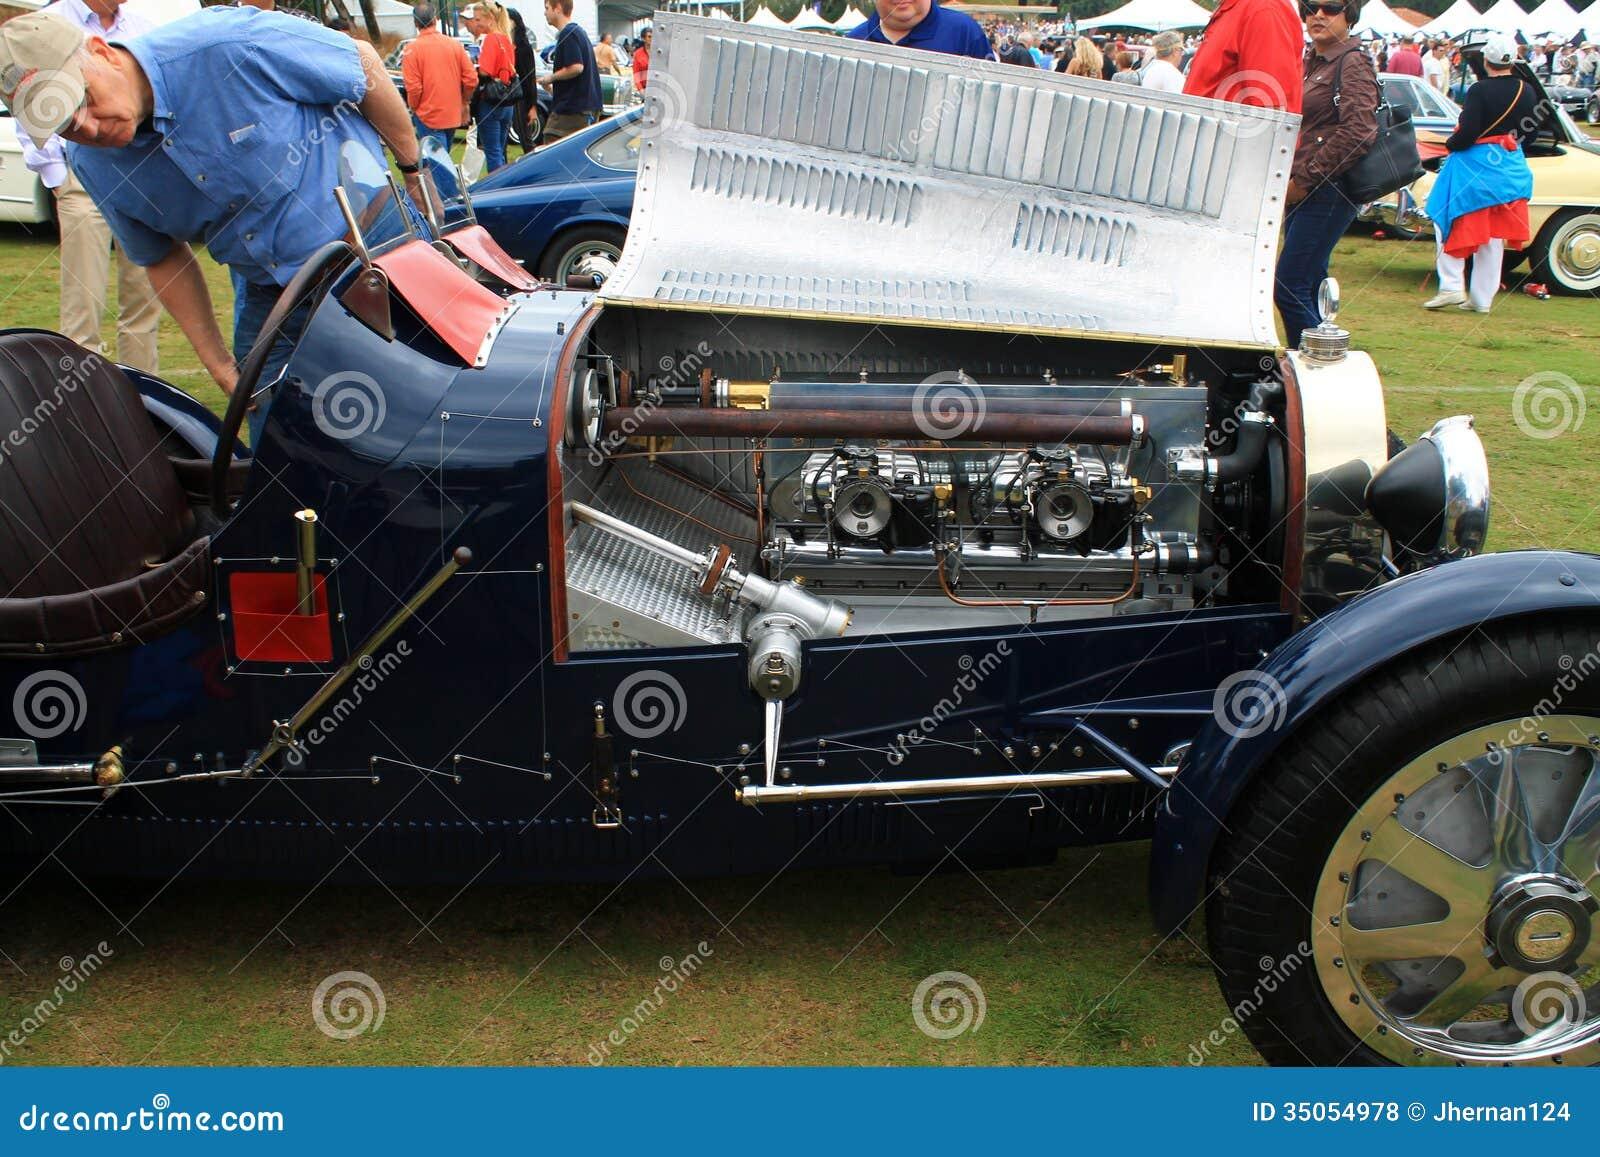 amateur radio operator casper wy